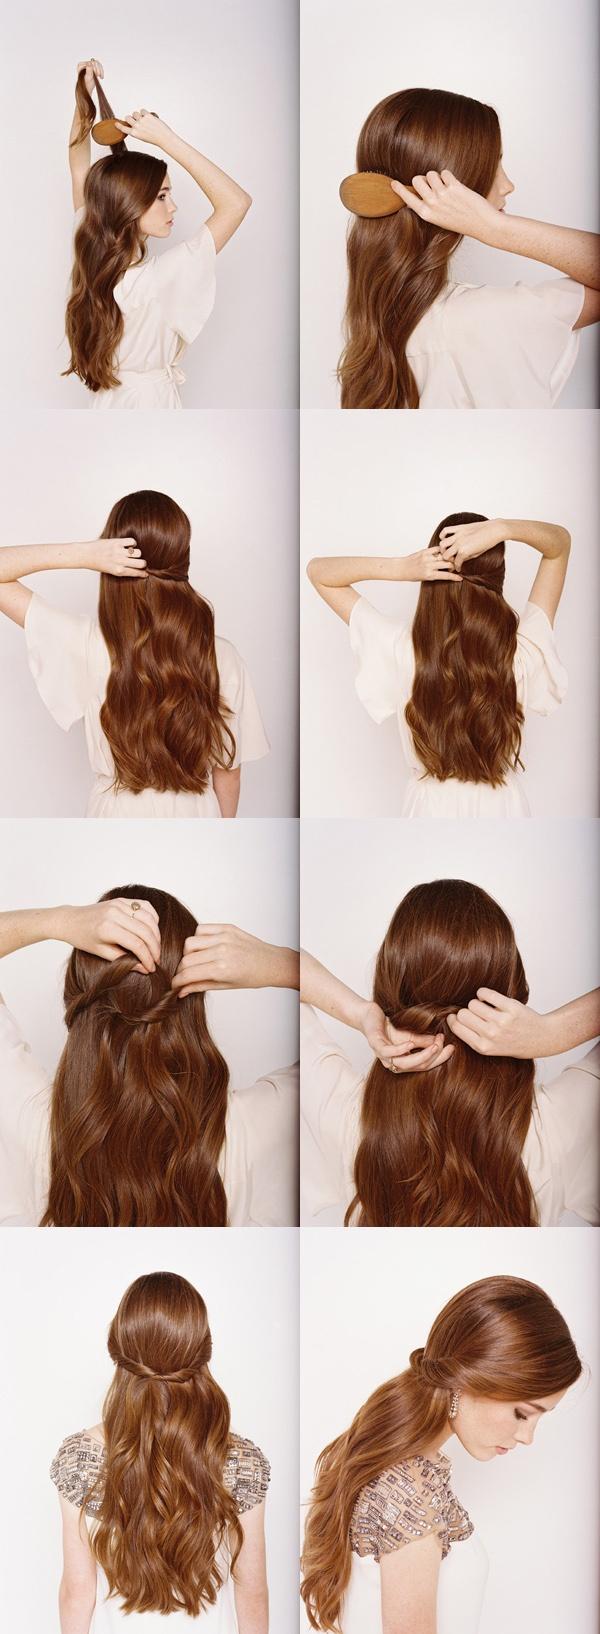 Pleasant 15 Stylish Half Up Half Down Tutorials Pretty Designs Short Hairstyles For Black Women Fulllsitofus